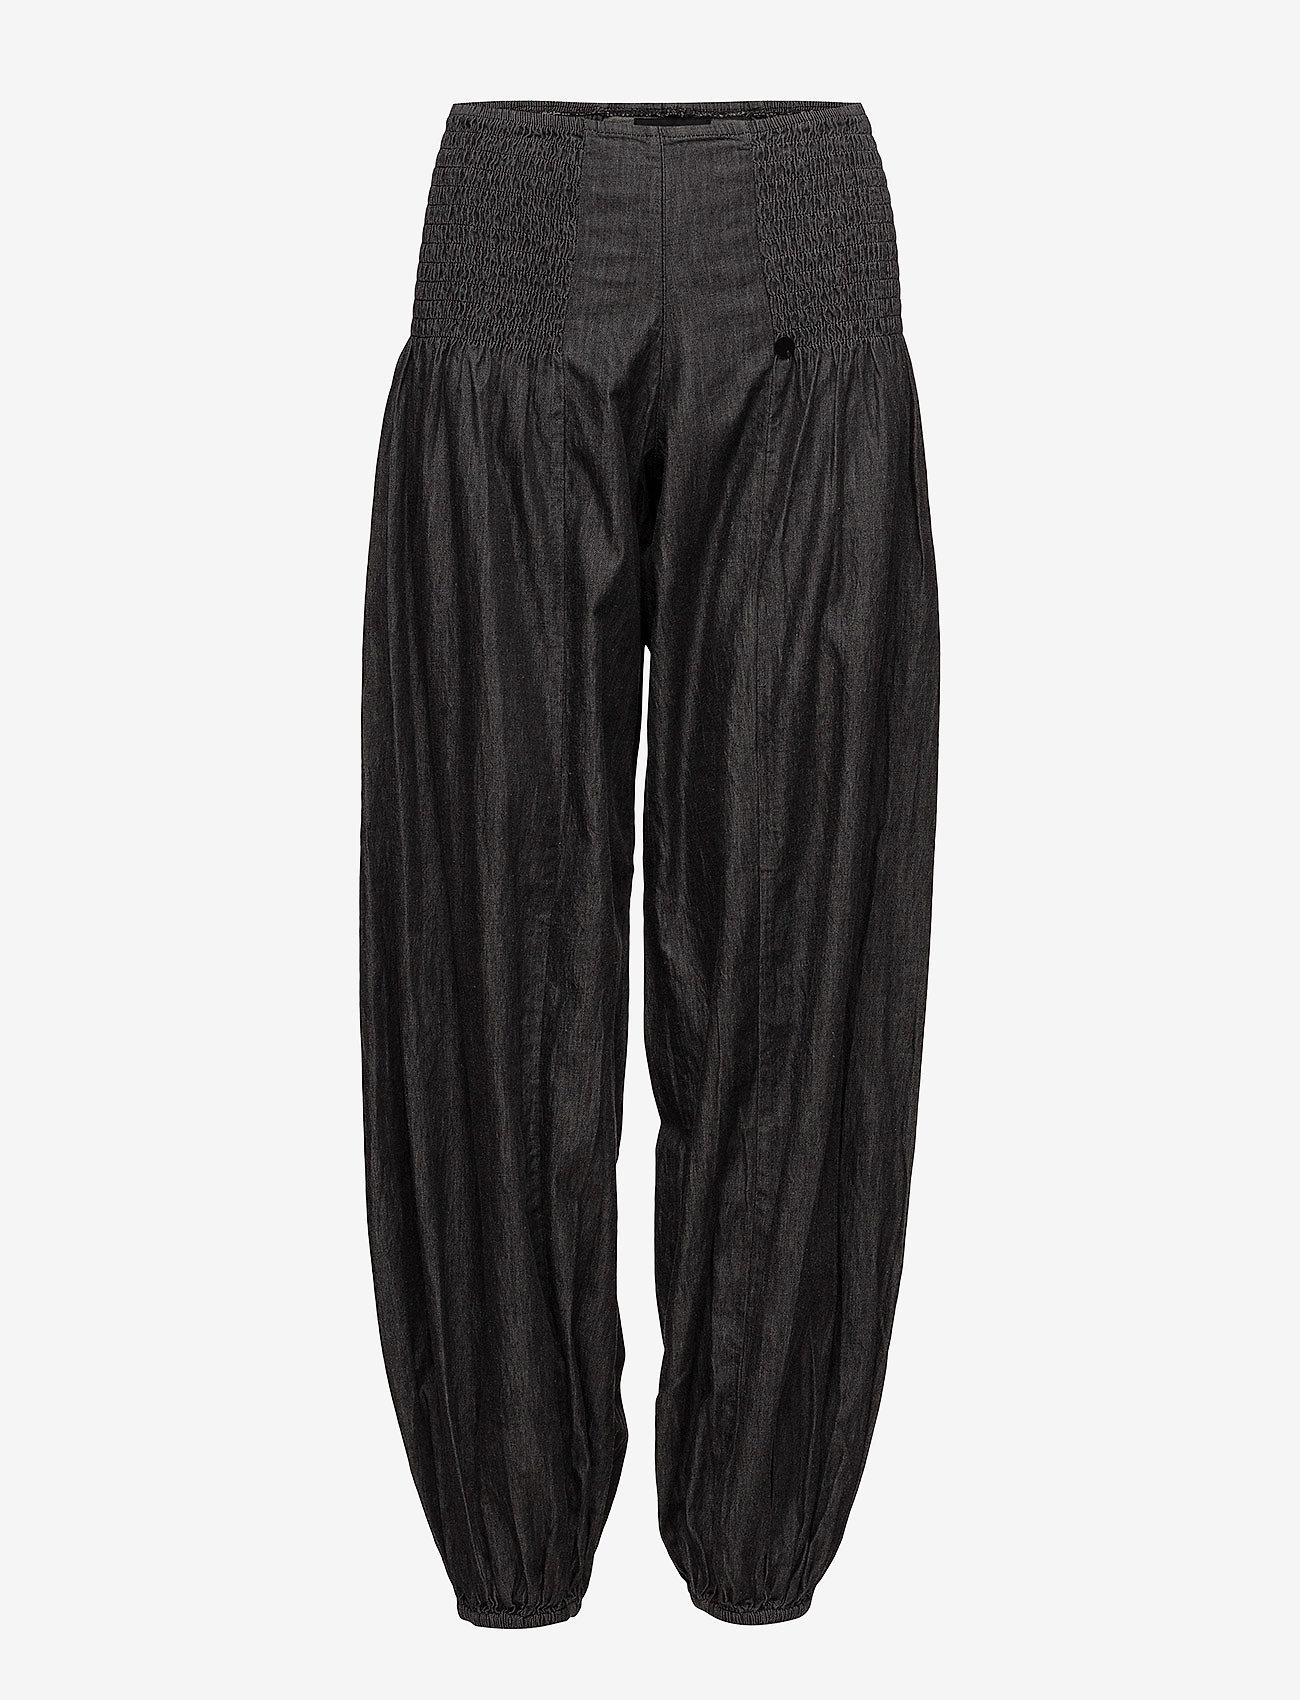 Pulz Jeans - Jill wide denim pant - casual bukser - black solid - 0